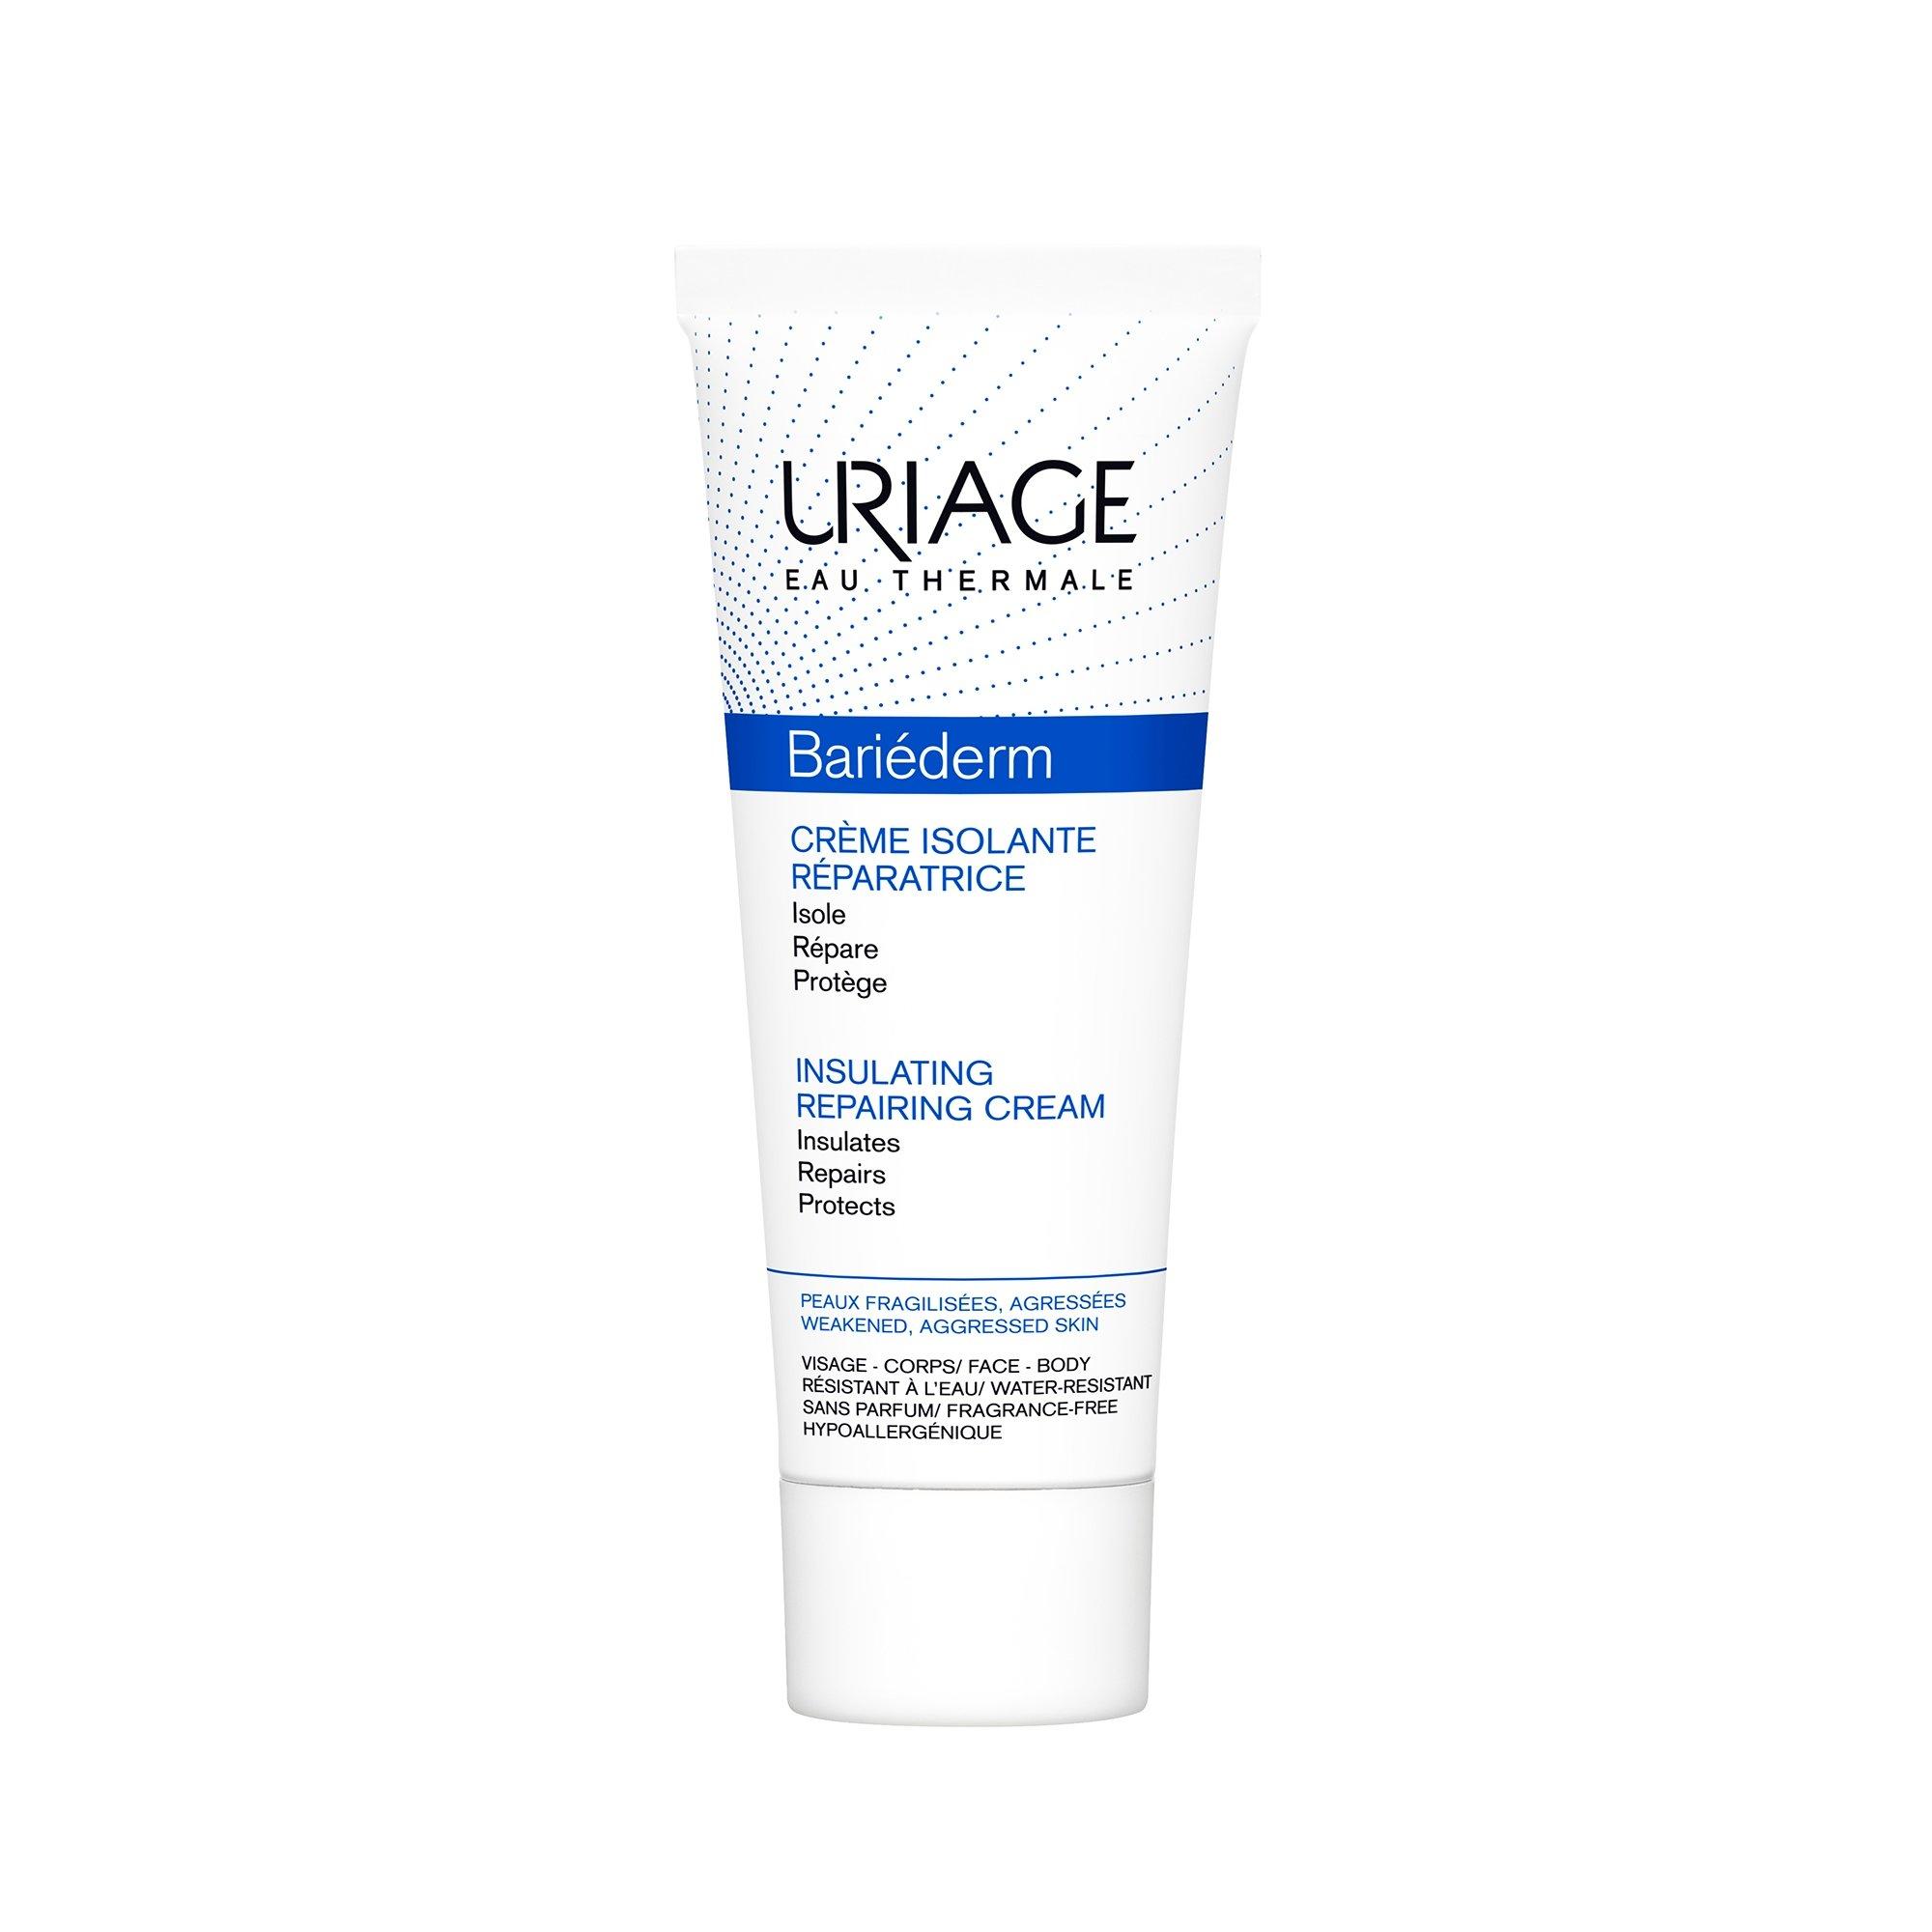 Uriage Bariederm Insulating Repairing Cream Παρέχει στο Δέρμα μια Αποτελεσματική Ασπίδα Προστασίας 75ml